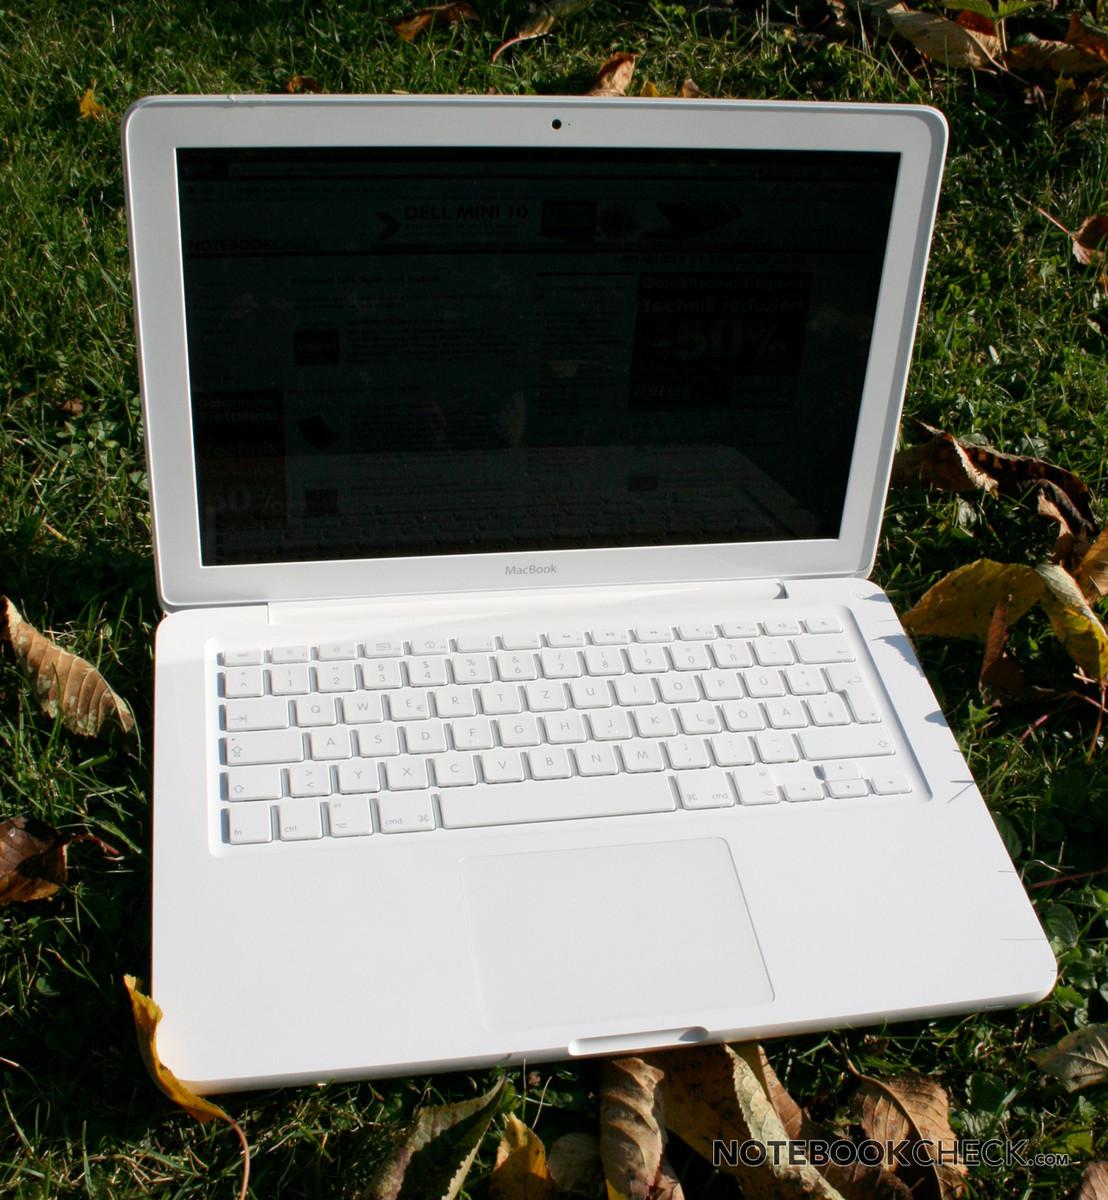 Installed Samsung 850 Ssd In 2009 White Macbook: Review Apple MacBook 2010-05 Notebook